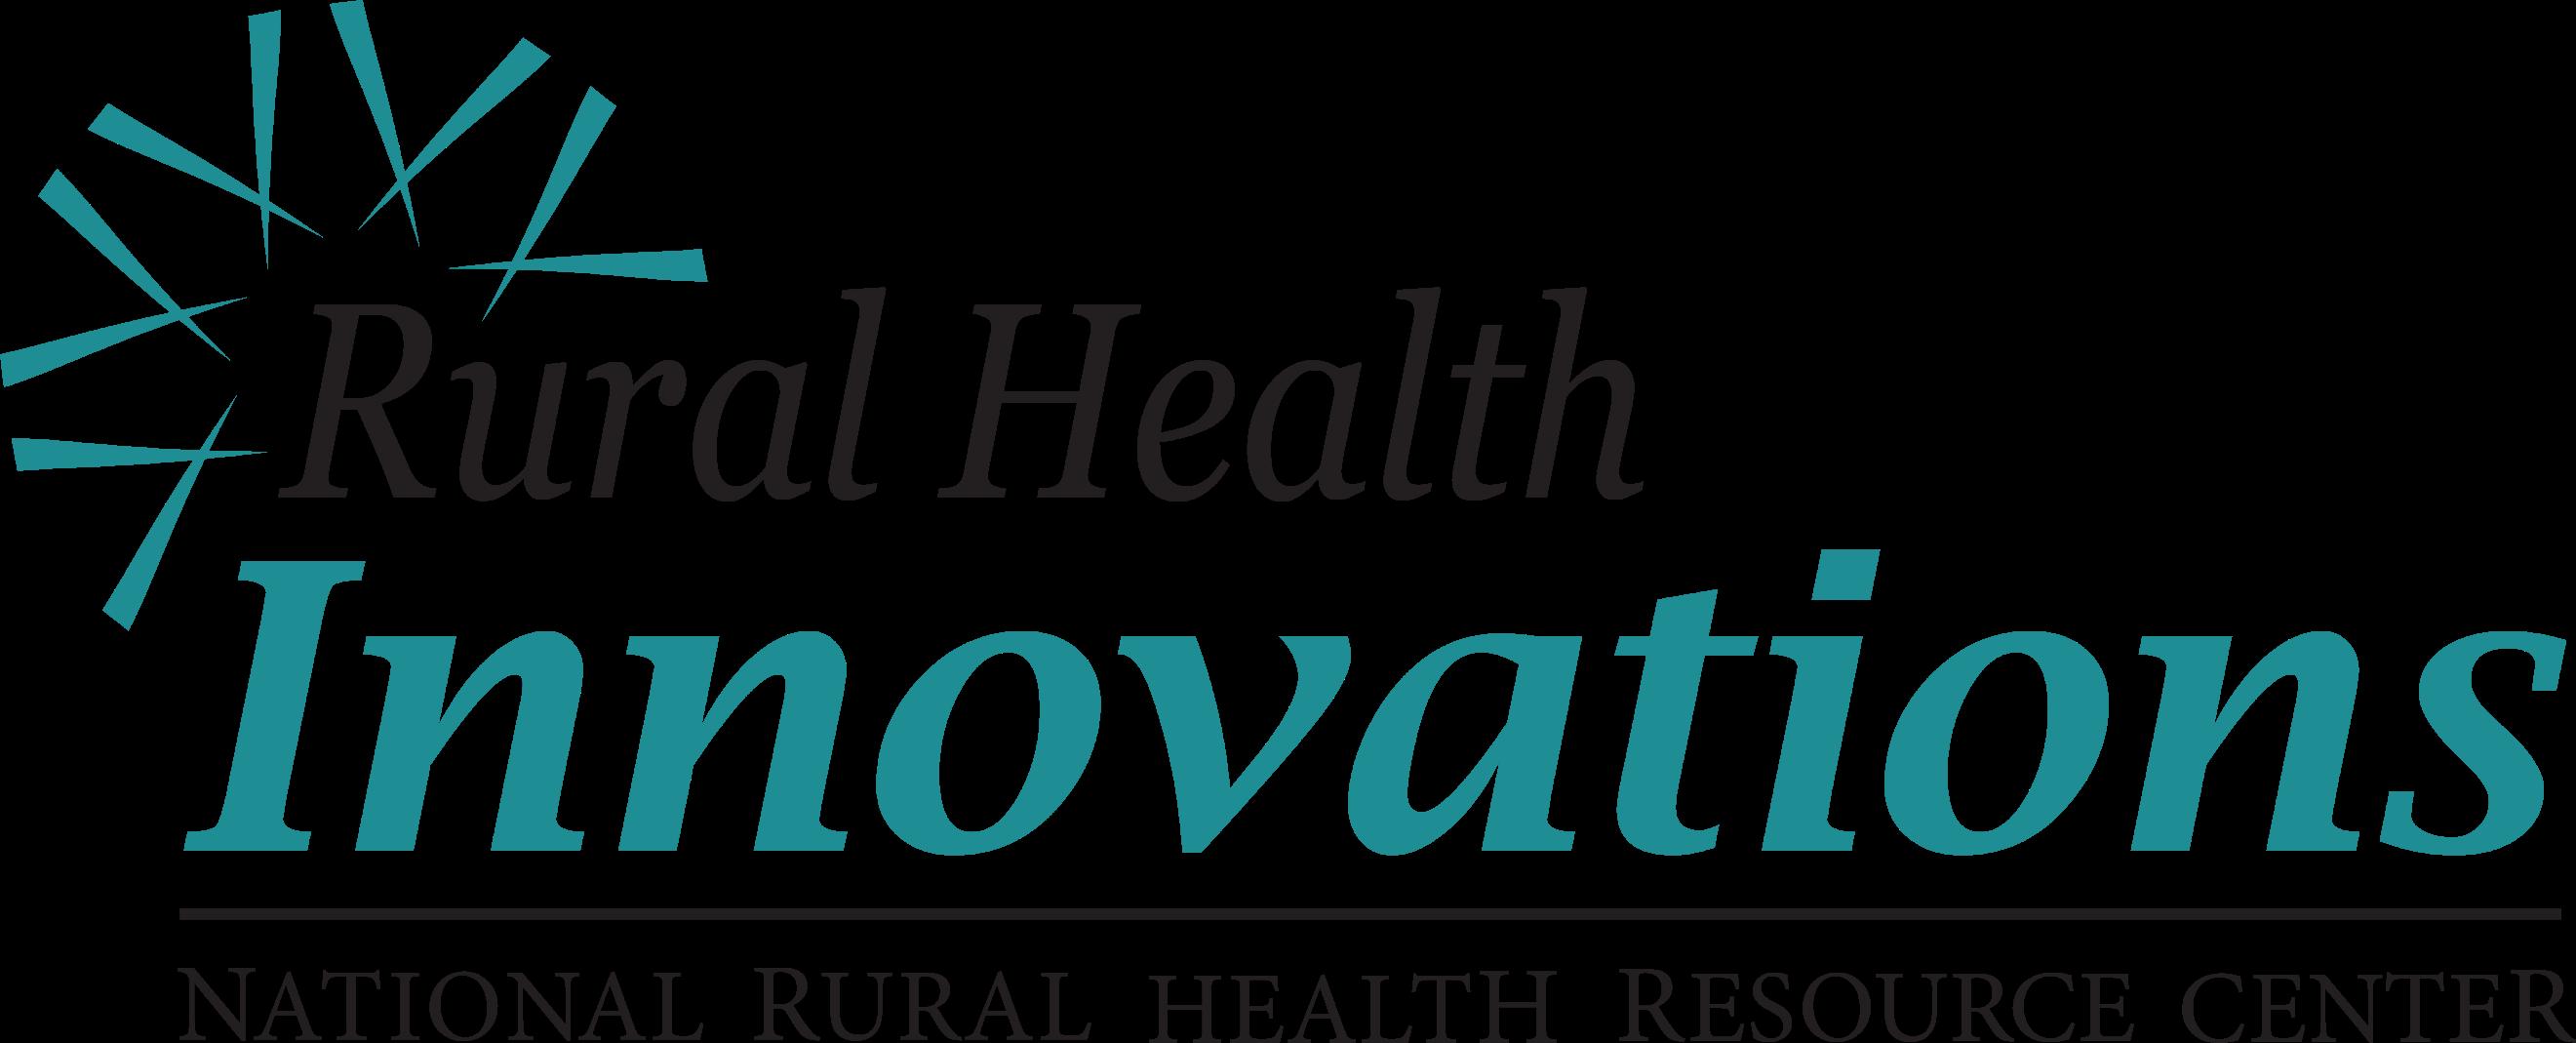 Small Rural Hospital Transition